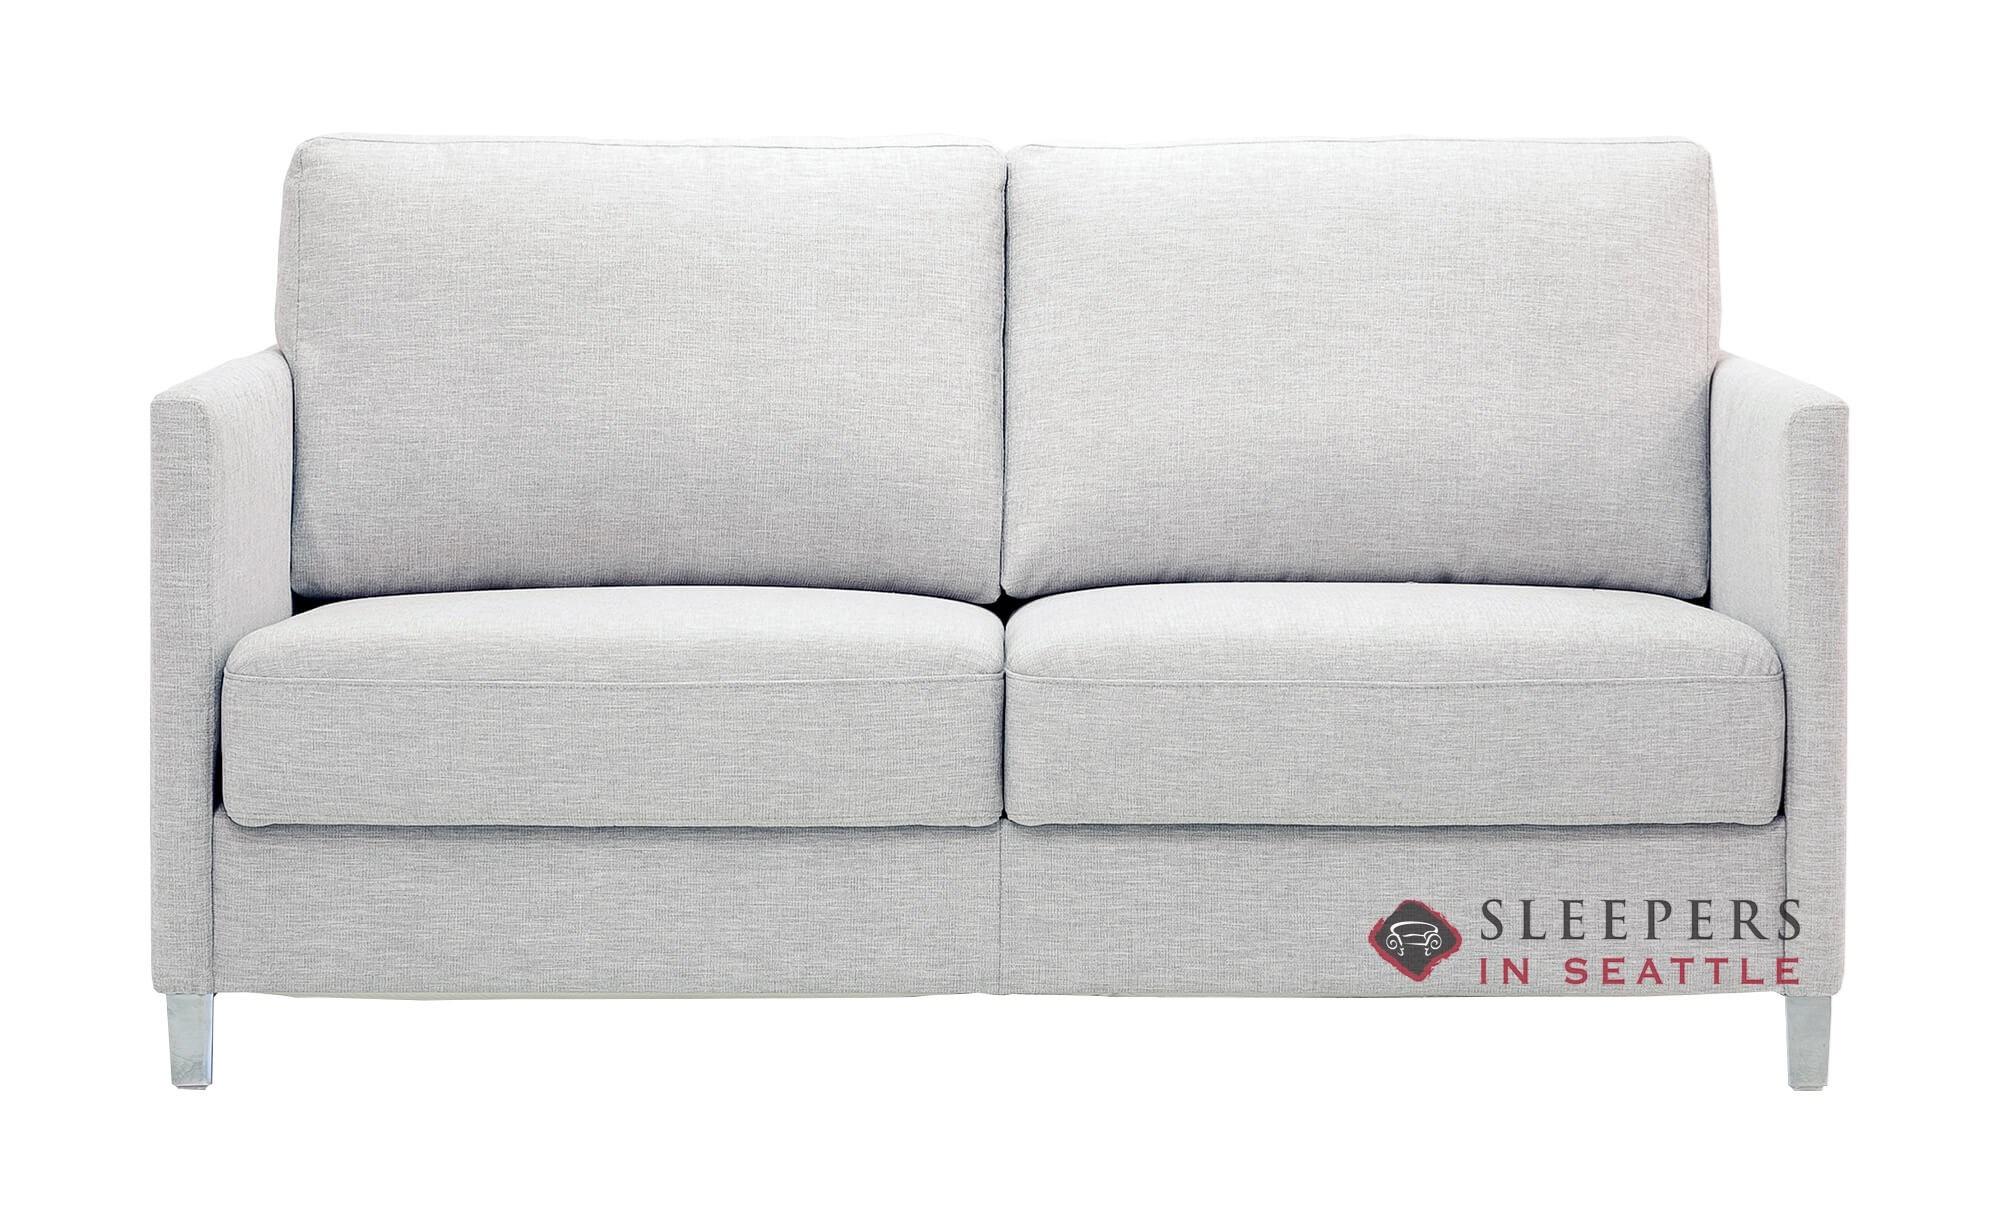 Elfin Full Fabric Sofa By Luonto, How To Fix A Sleeper Sofa